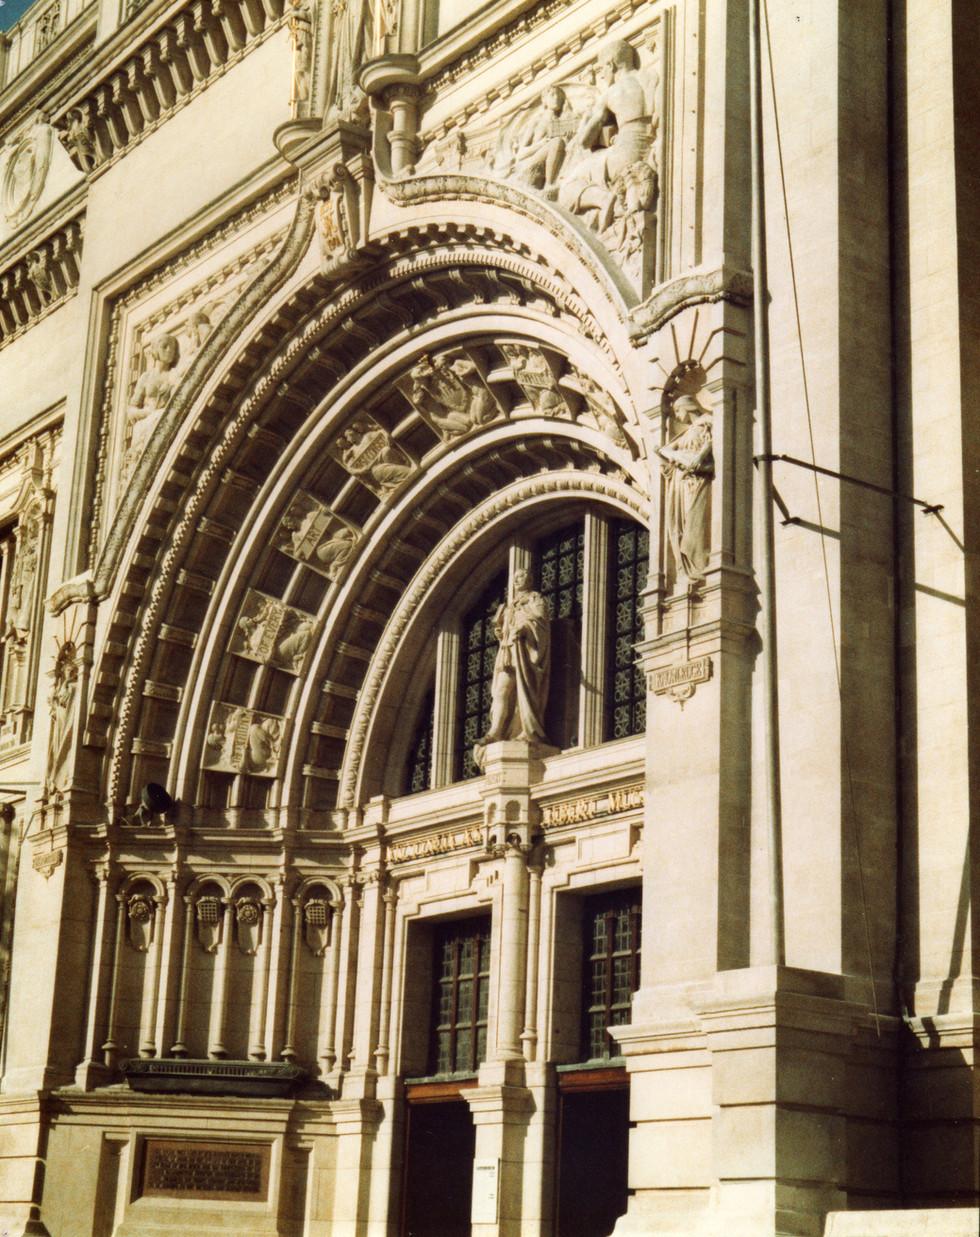 The Victoria & Albert Museum, London.